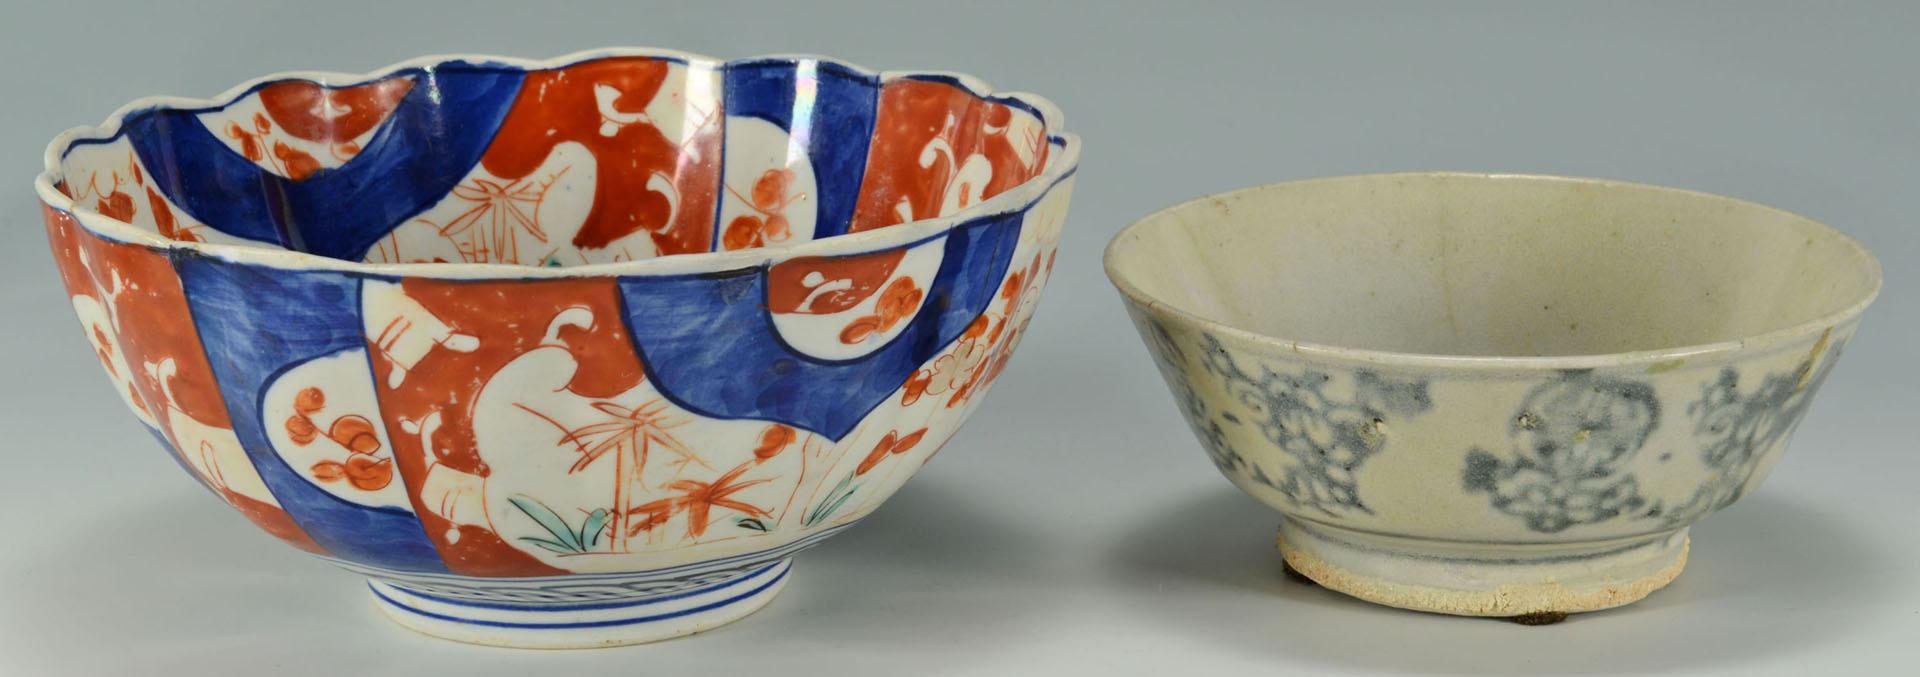 Lot 163: 8 pcs English & Asian Porcelain, inc. inkwell